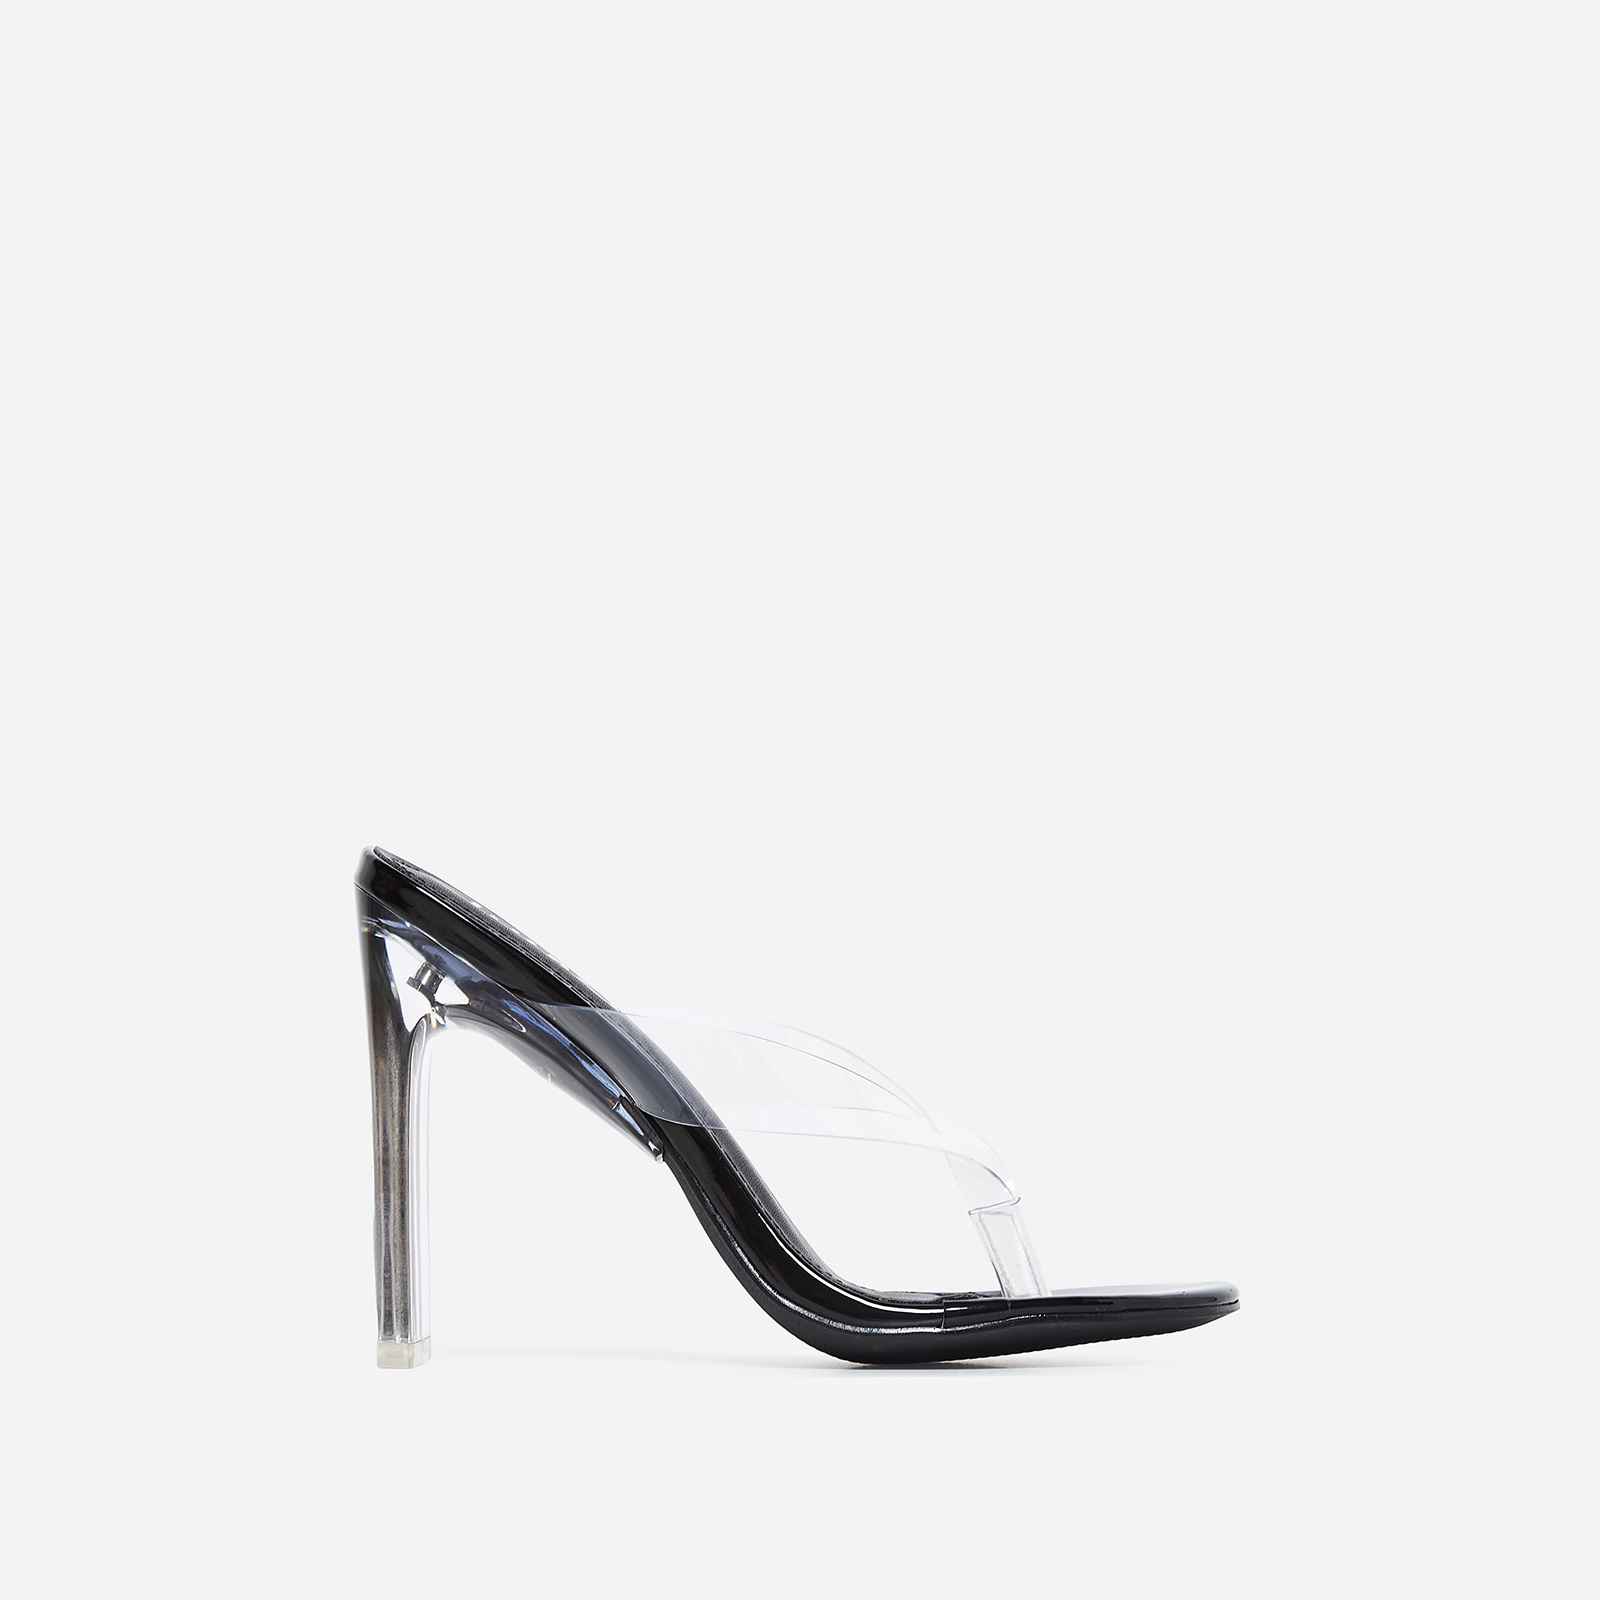 Scandal Flip Flop Flat Perspex Heel In Black Patent